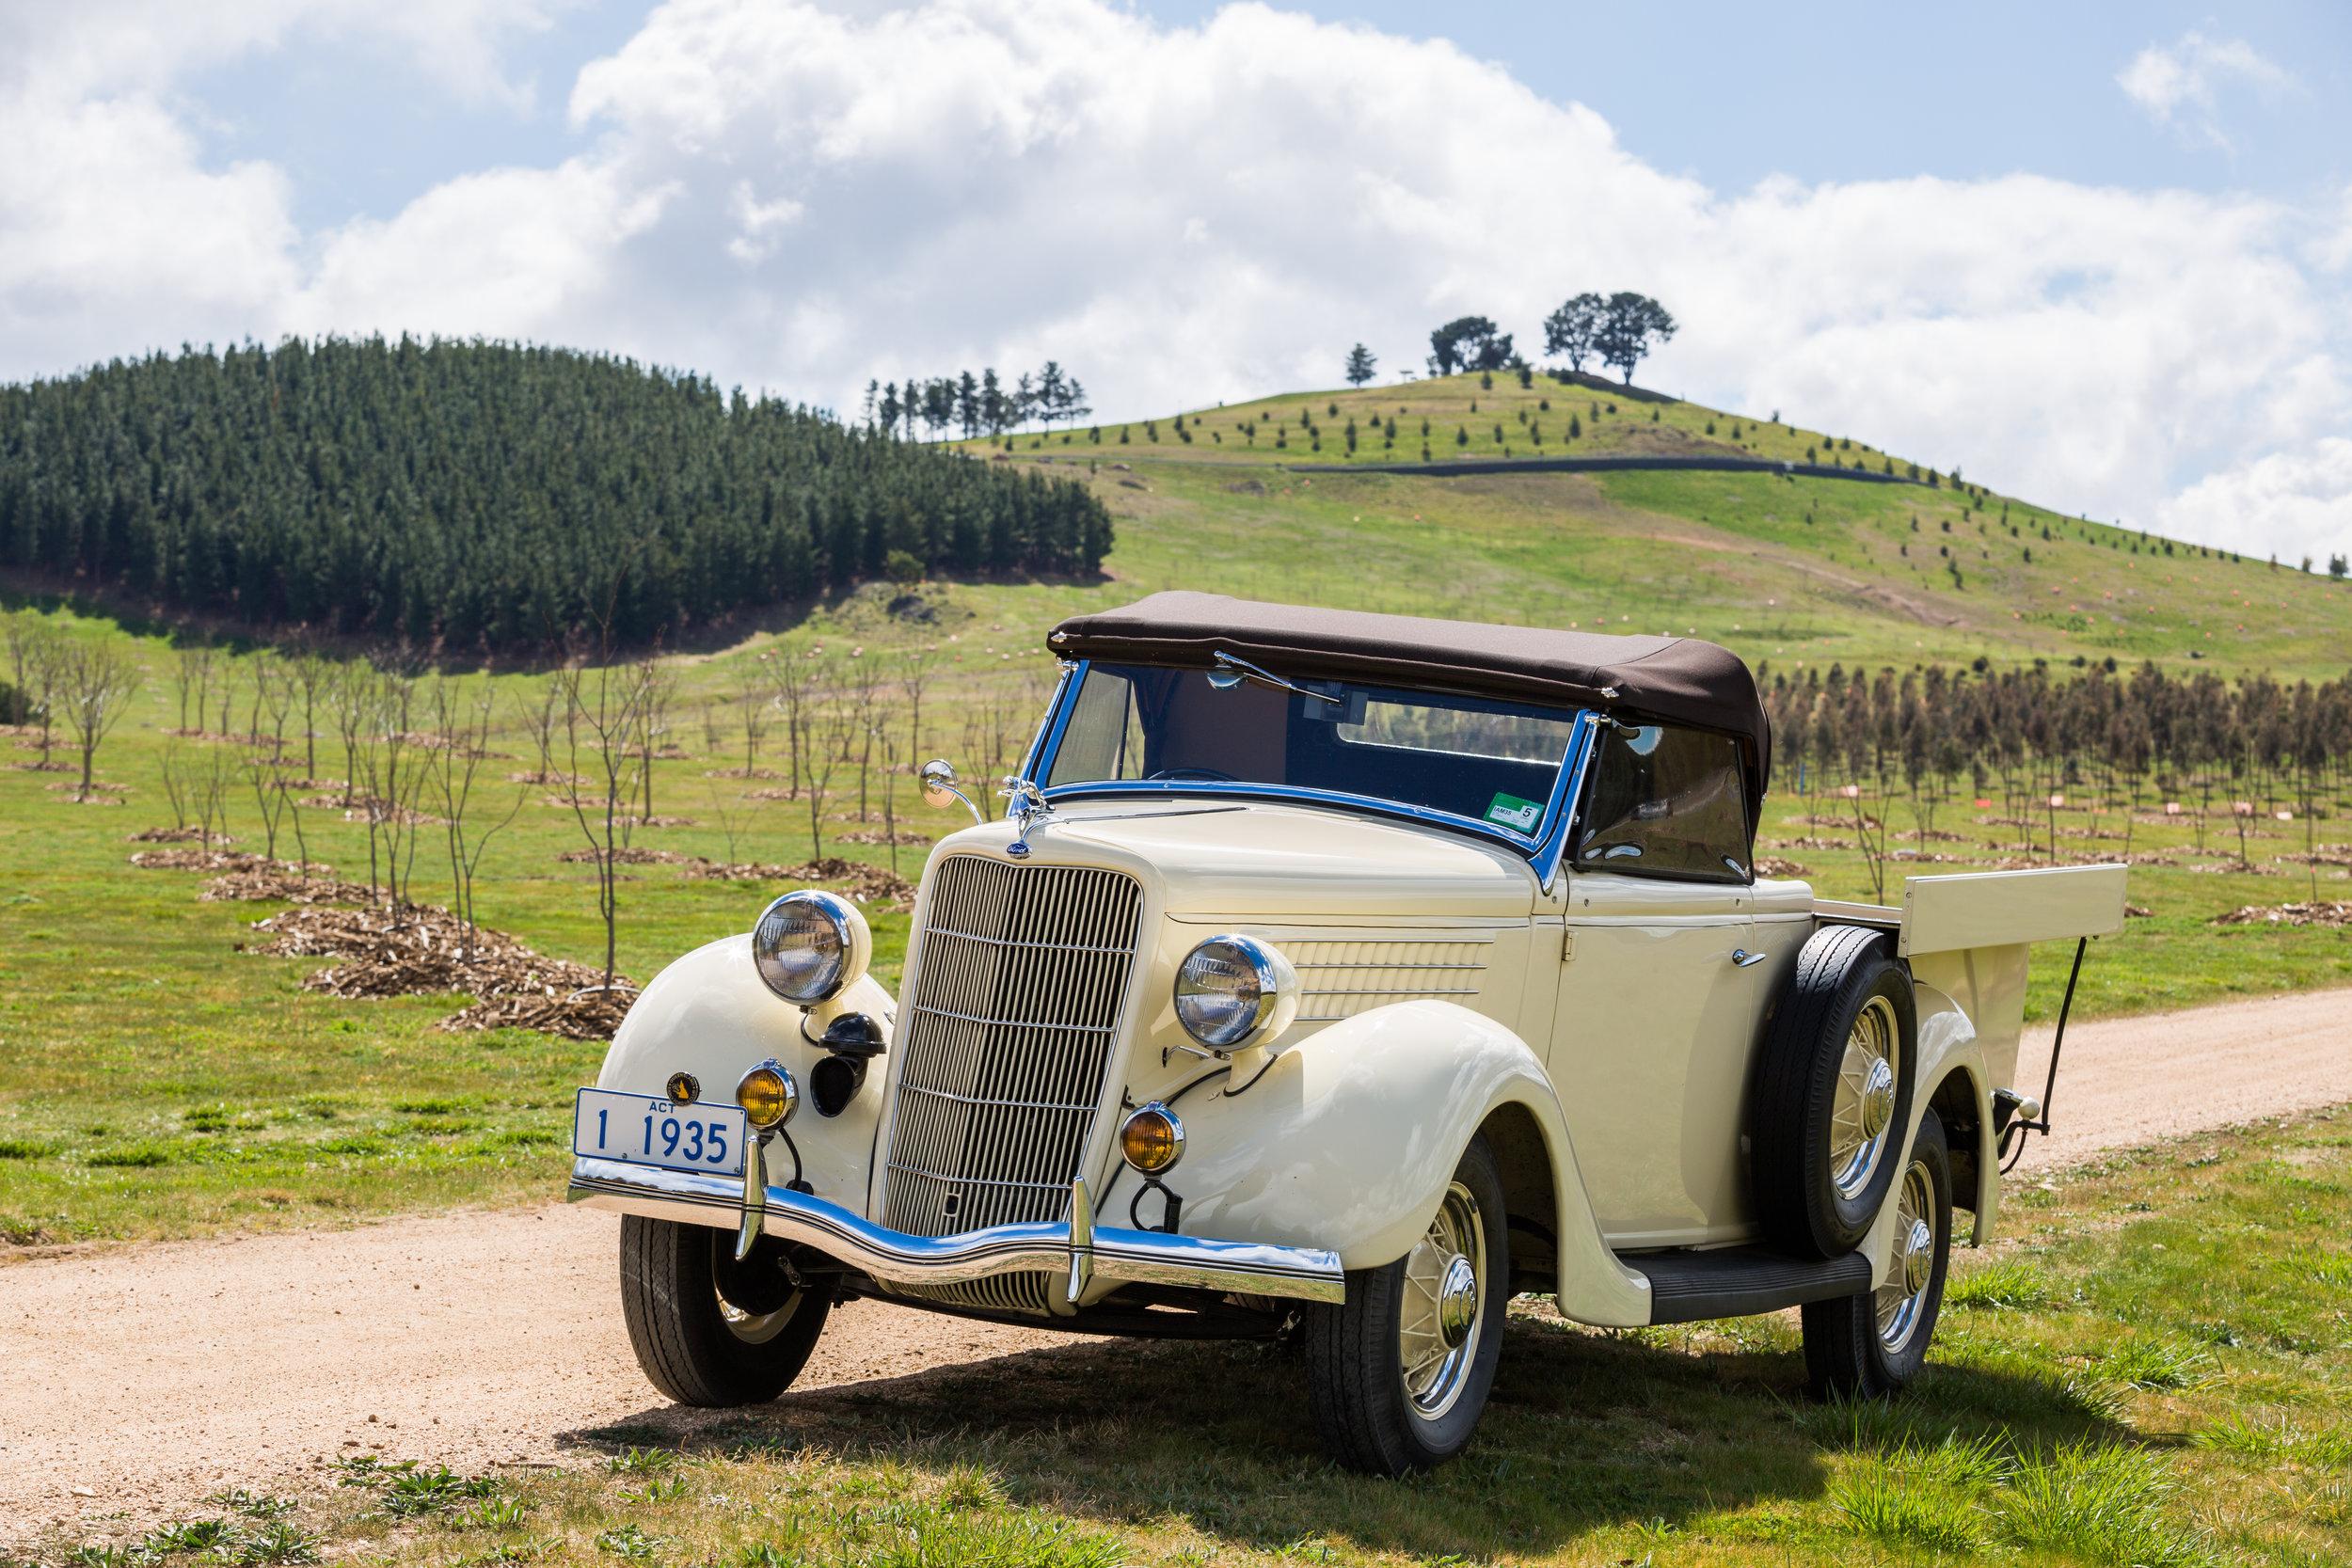 1935 Ford Roadster Ute